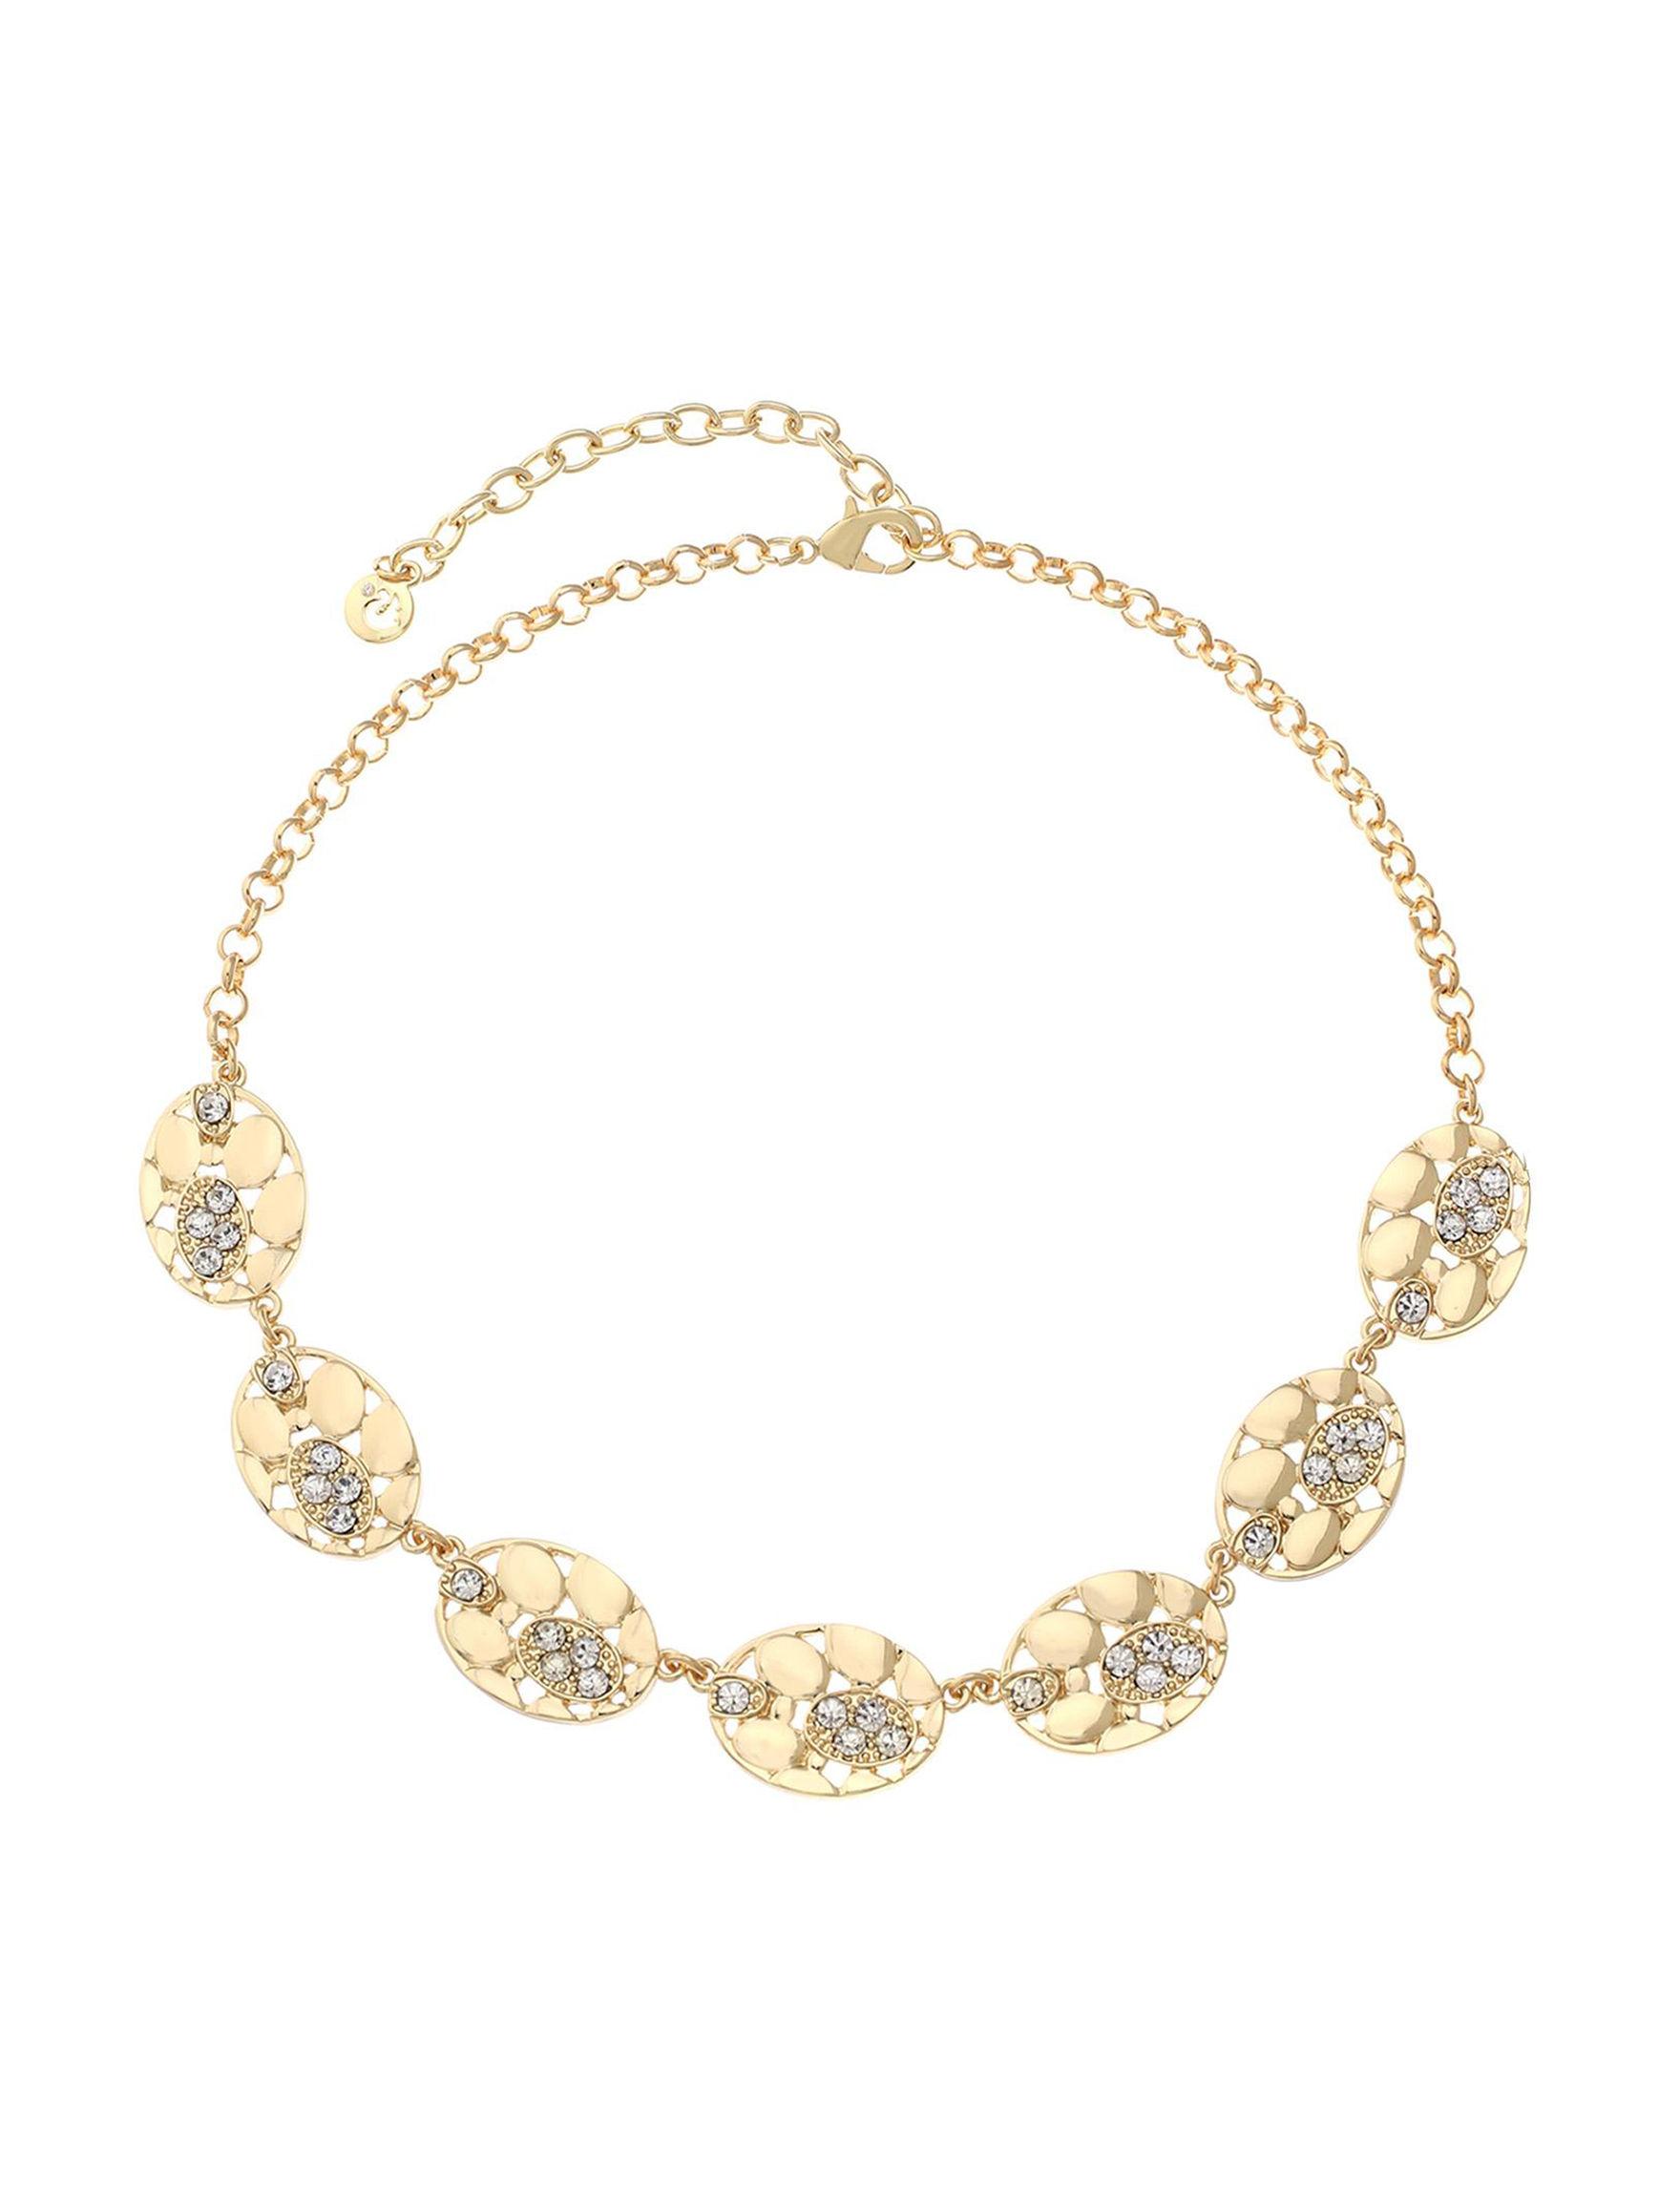 Gloria Vanderbilt Gold Necklaces & Pendants Fashion Jewelry